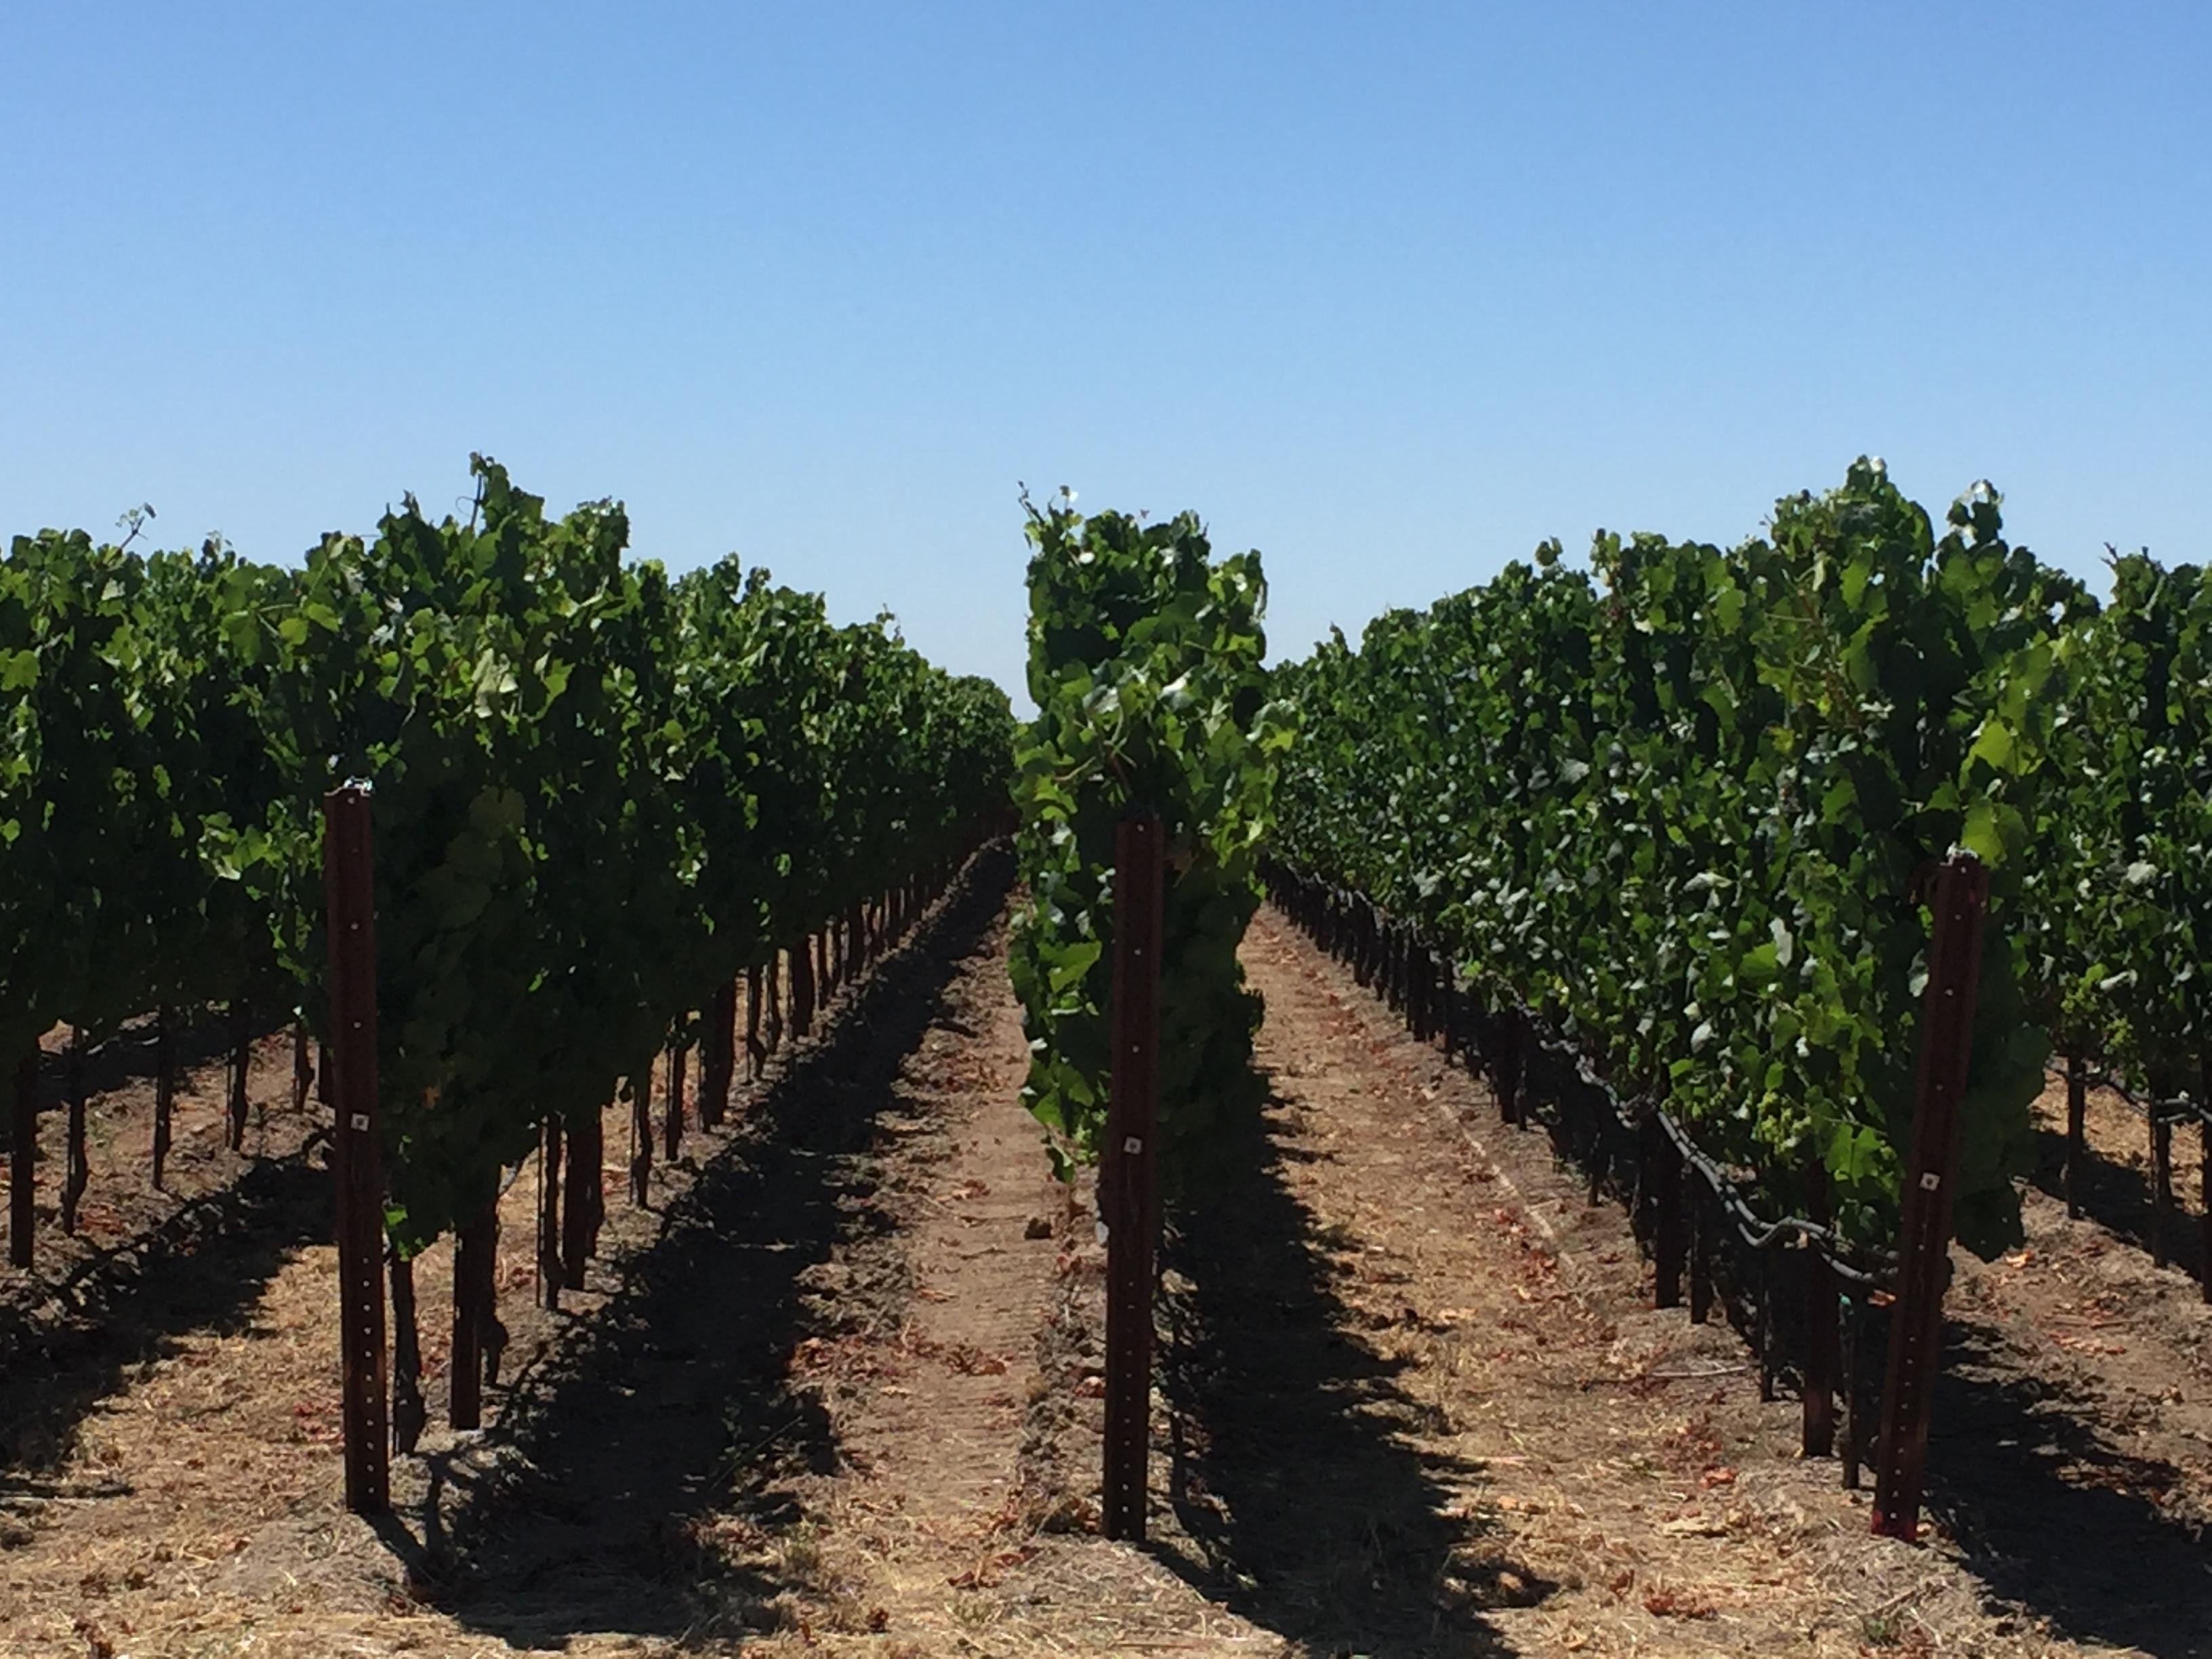 Martaella vines